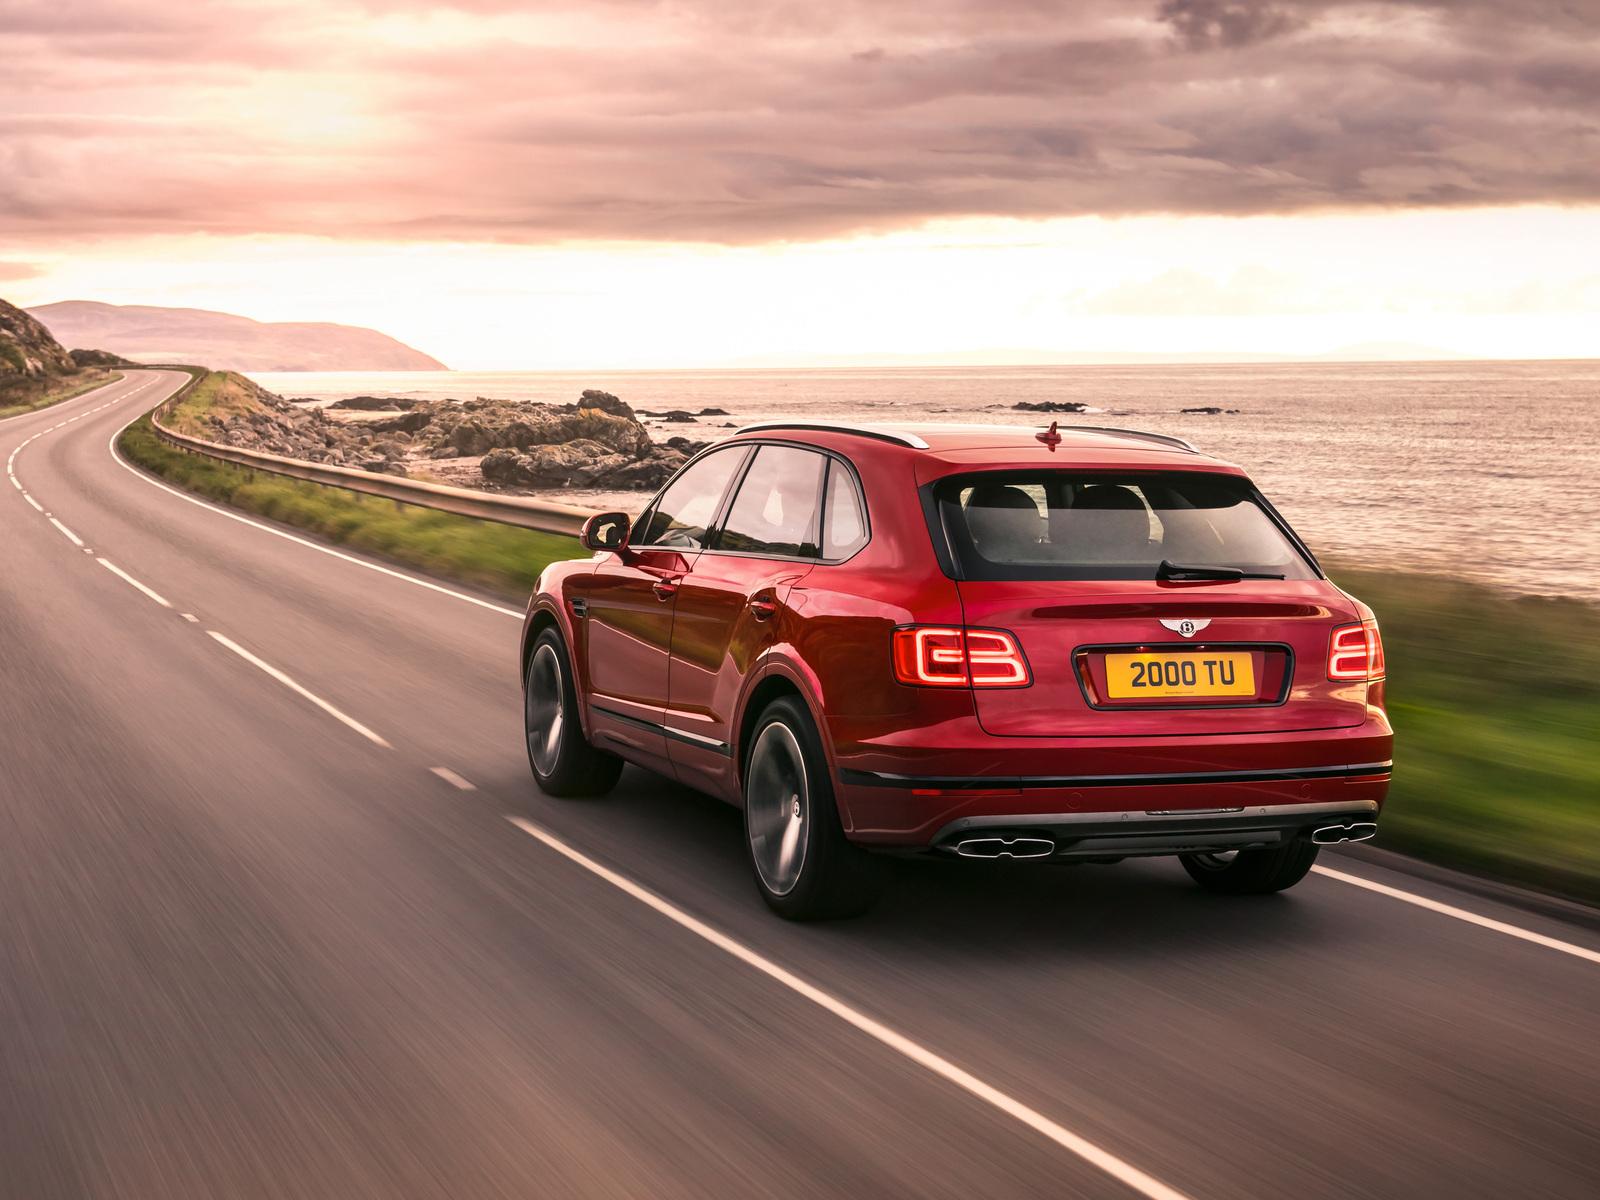 bentley-bentayga-v8-rear-view-2018-lm.jpg